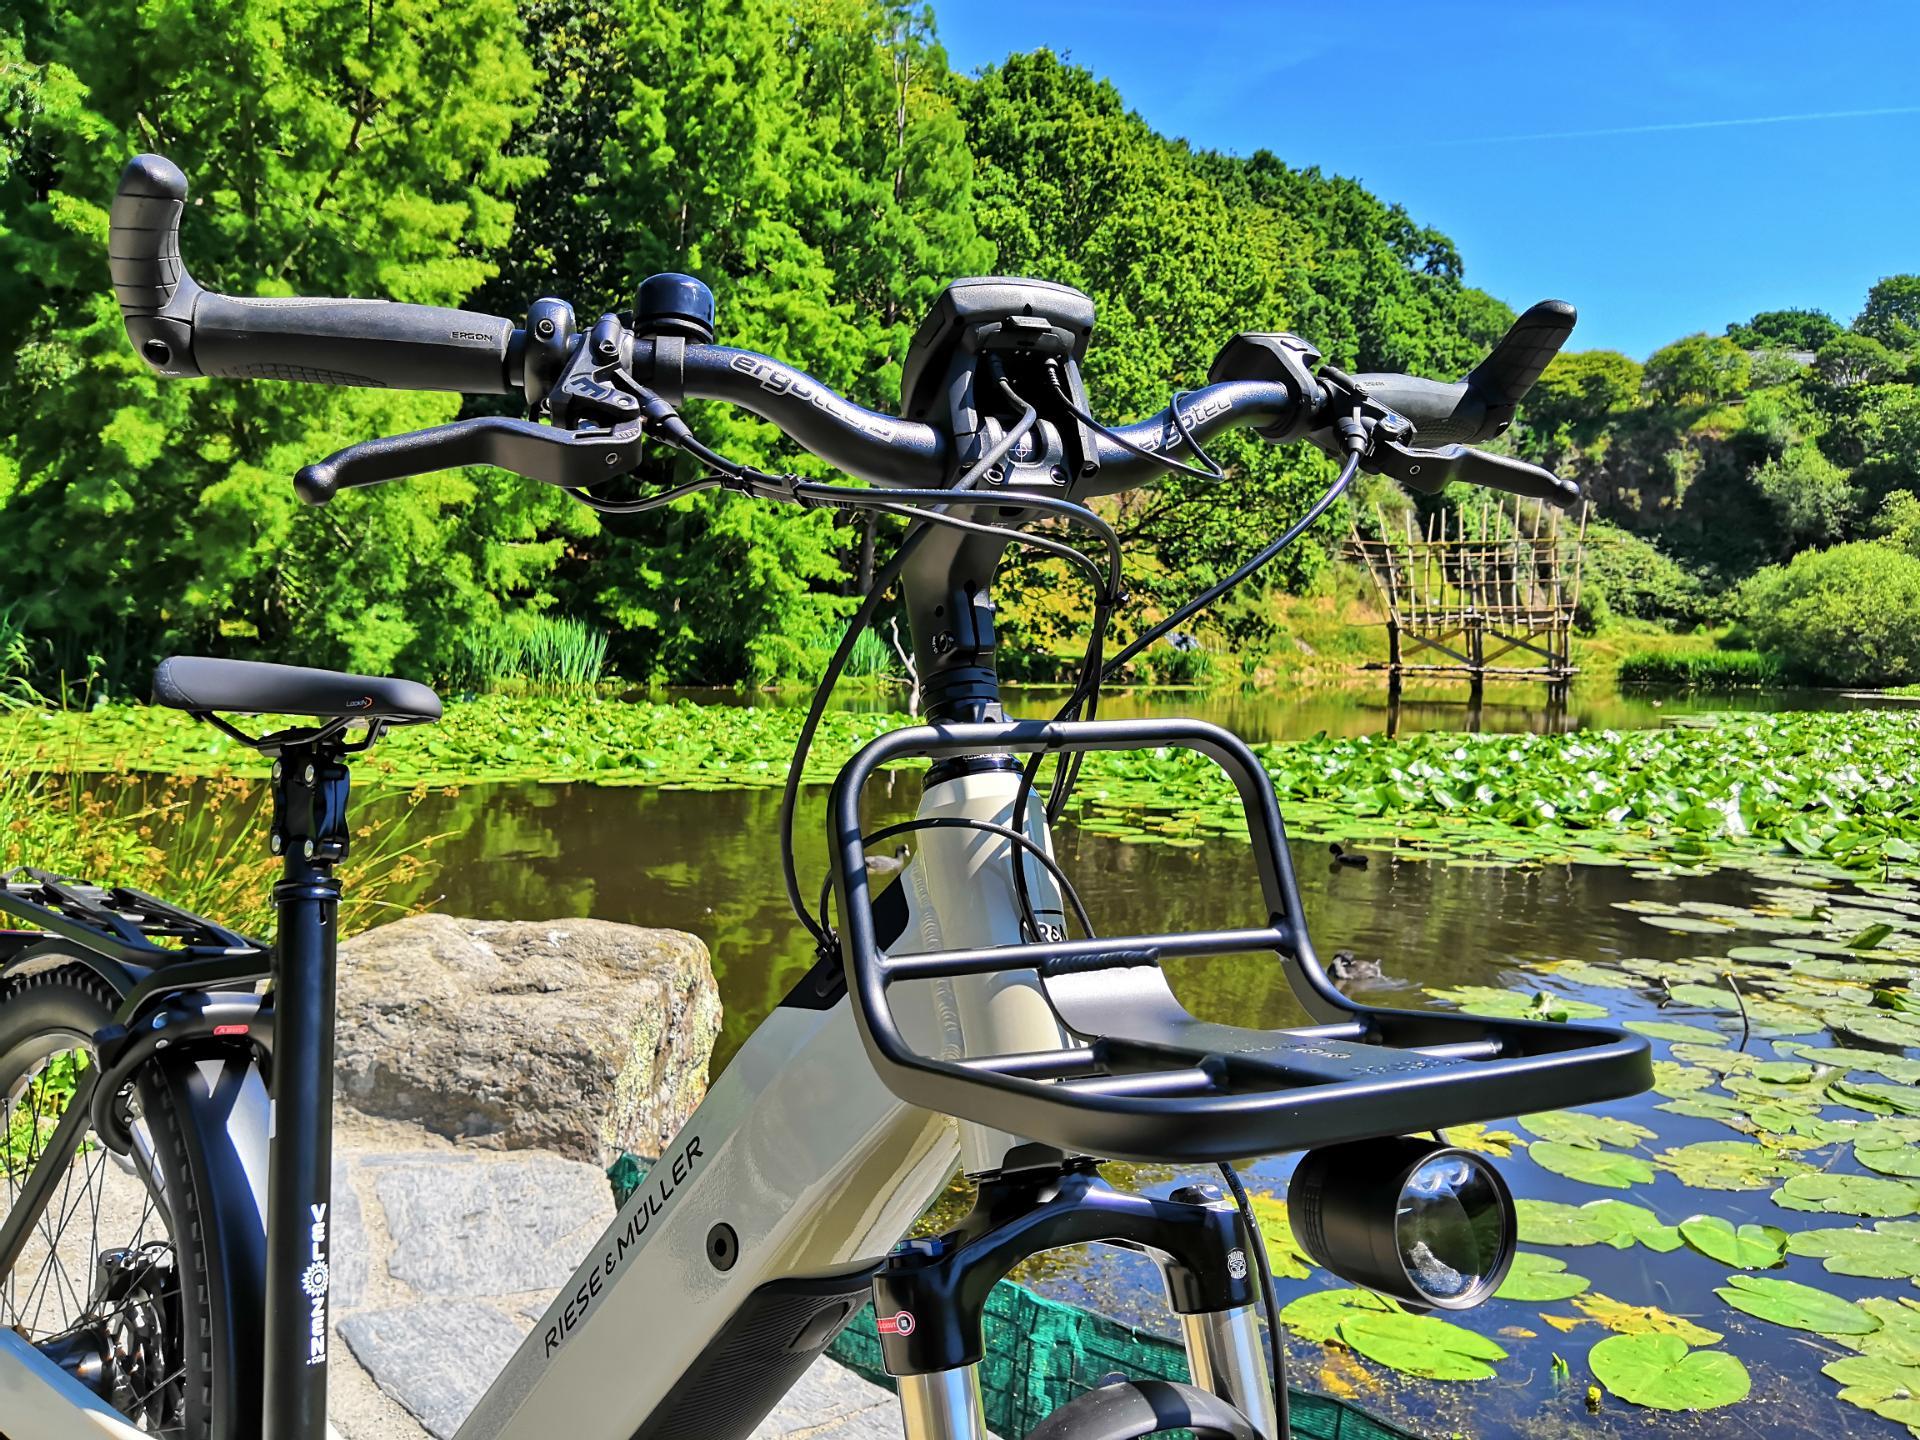 Vélo électrique Nevo GX Rohloff